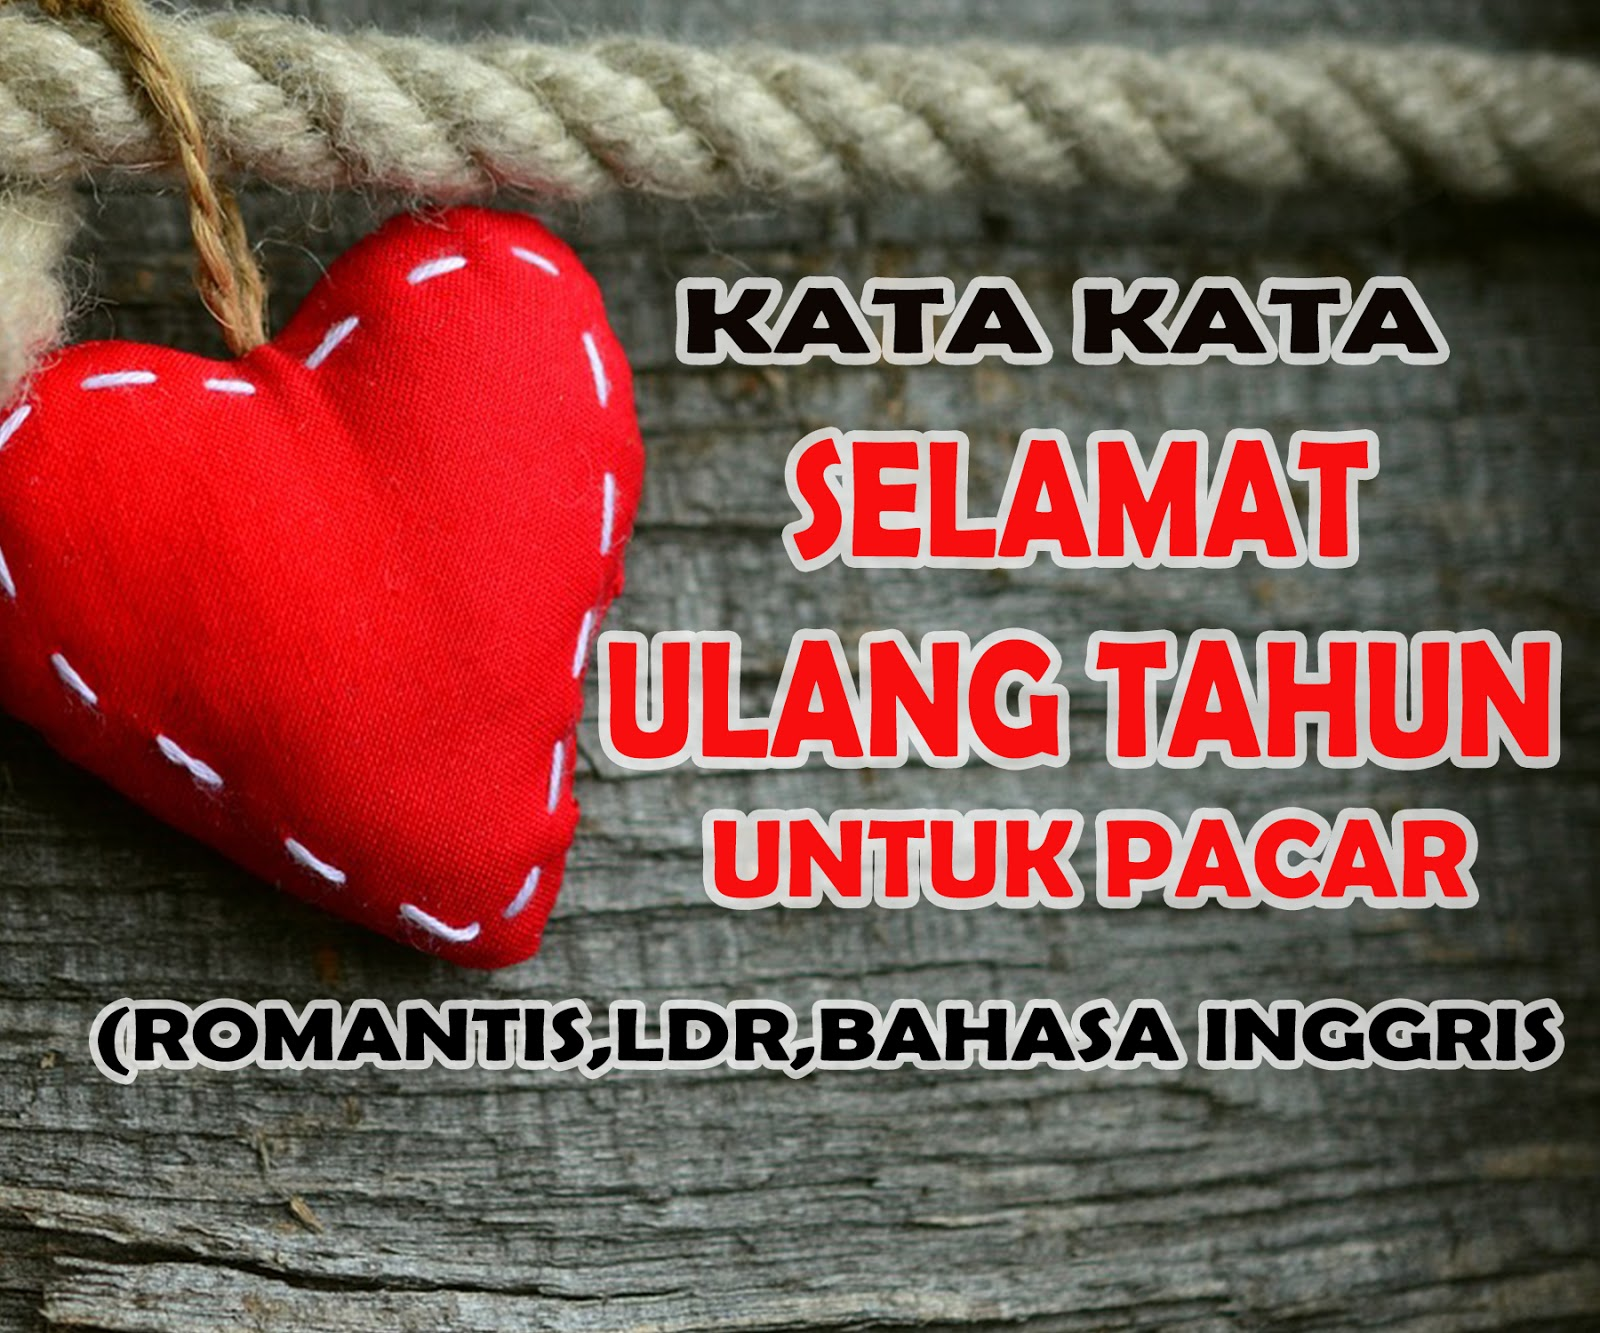 Ucapan Romantis Ulang Tahun Untuk Pacar Nusagates